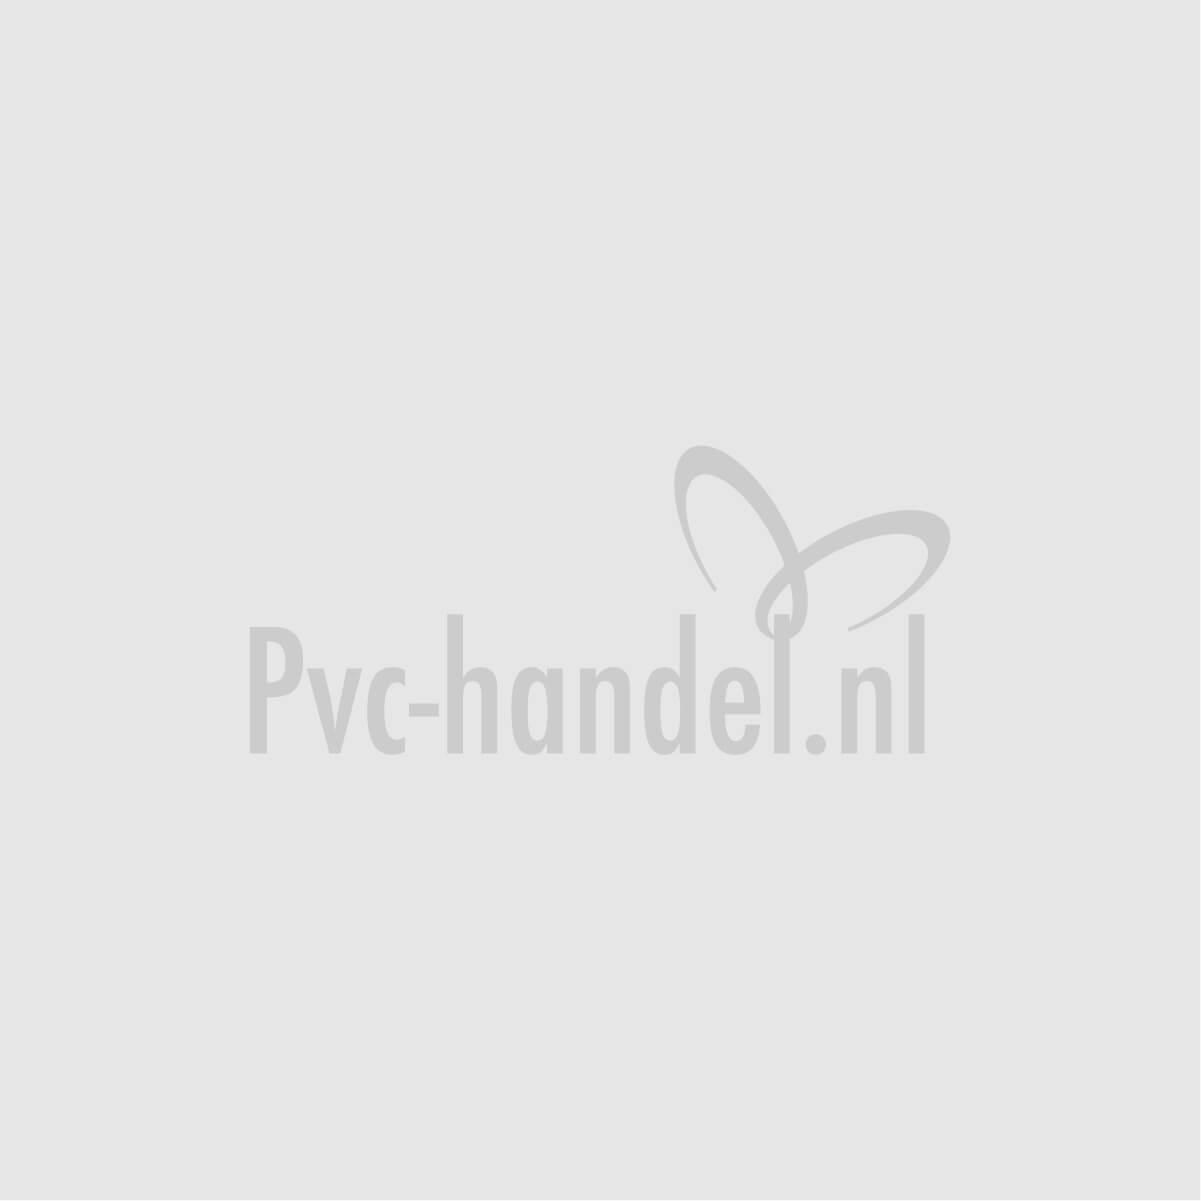 Griffon uni-100 lijm